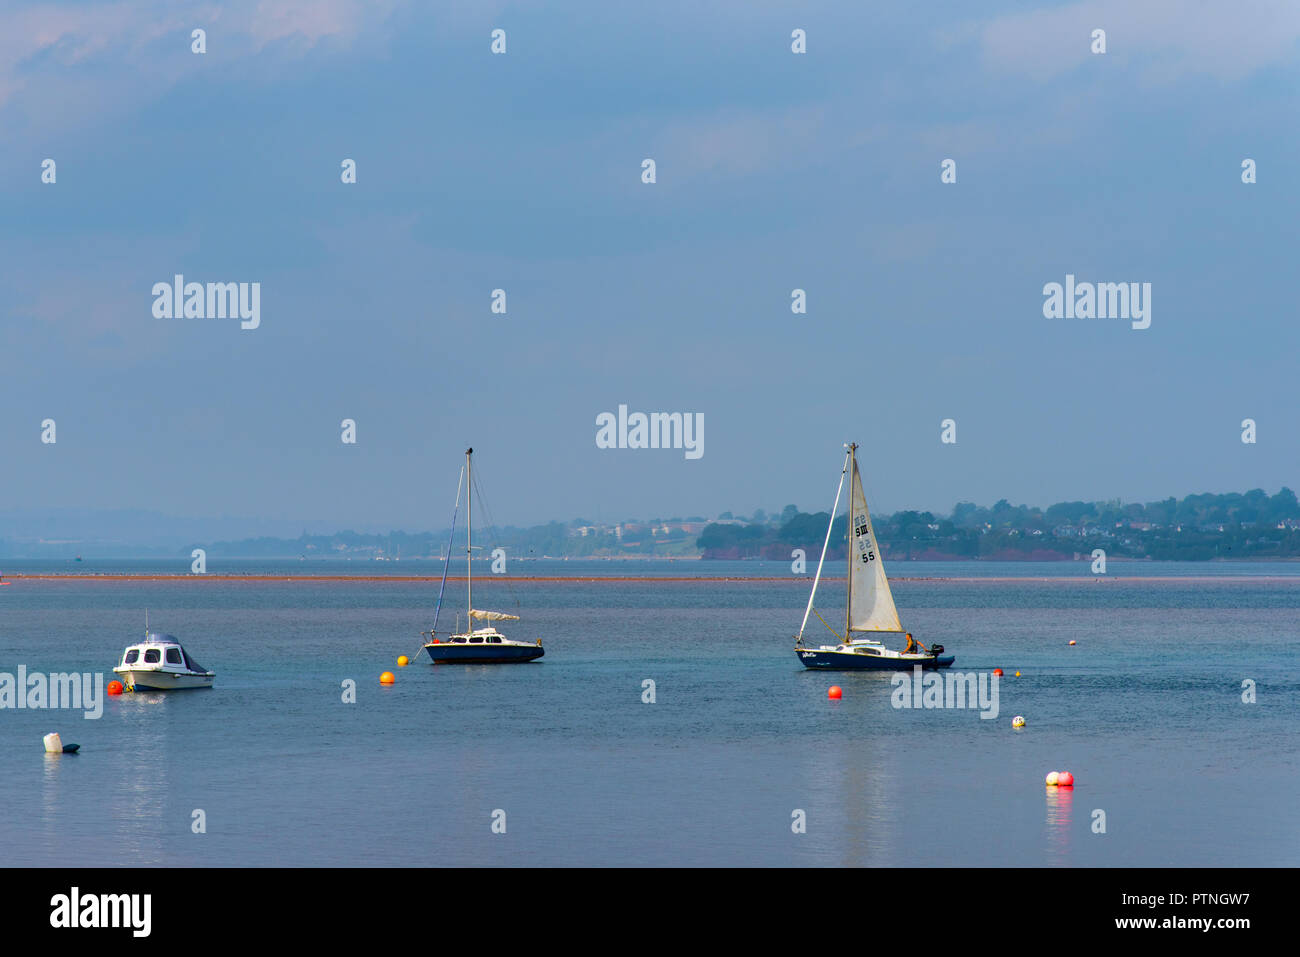 Sailing on the River Exe Estuary, Exmouth, Devon, UK. - Stock Image